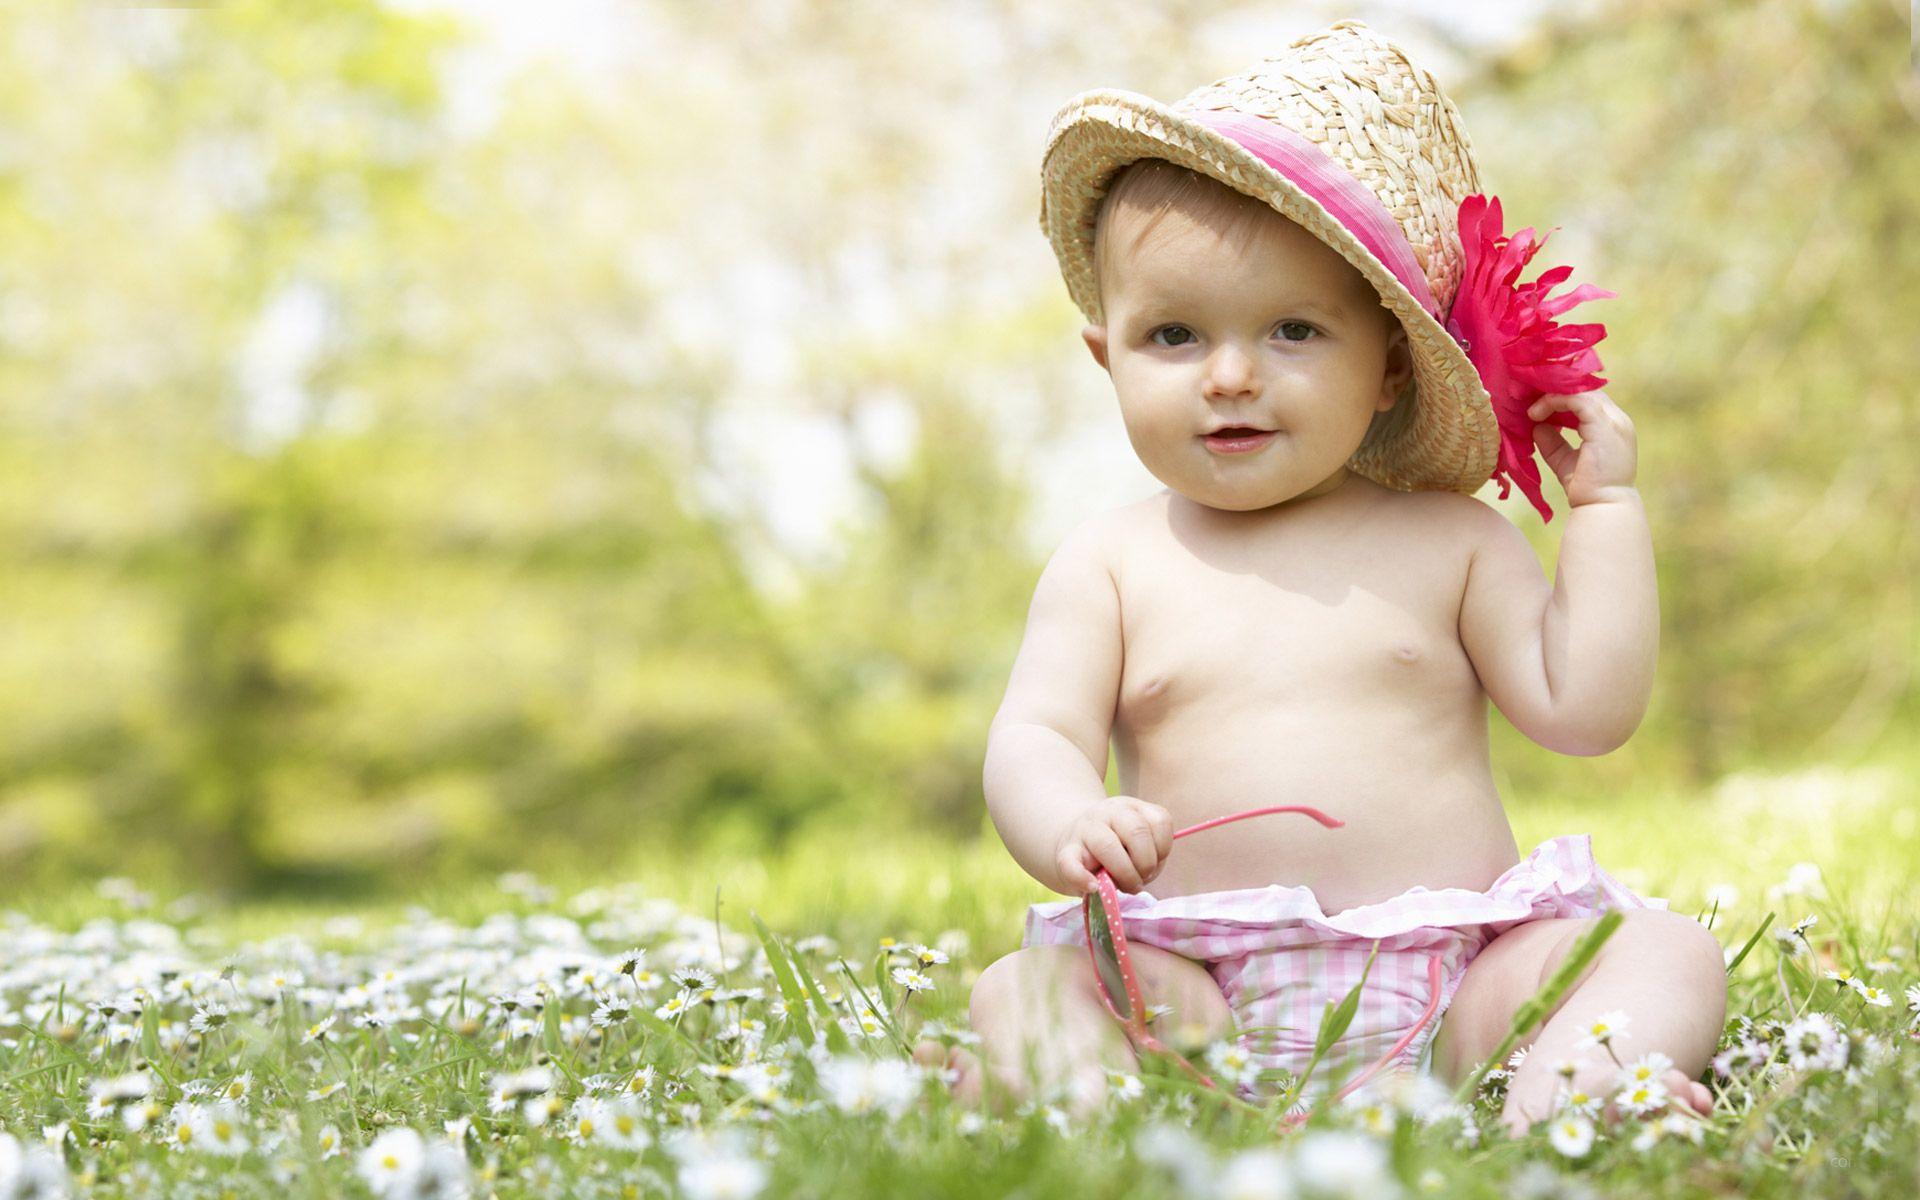 Cute And Sweet Girl Hd Wallpaper Hd Wallpapers Sweet Baby Wallpaper Cute Baby Wallpaper Baby Girl Wallpaper